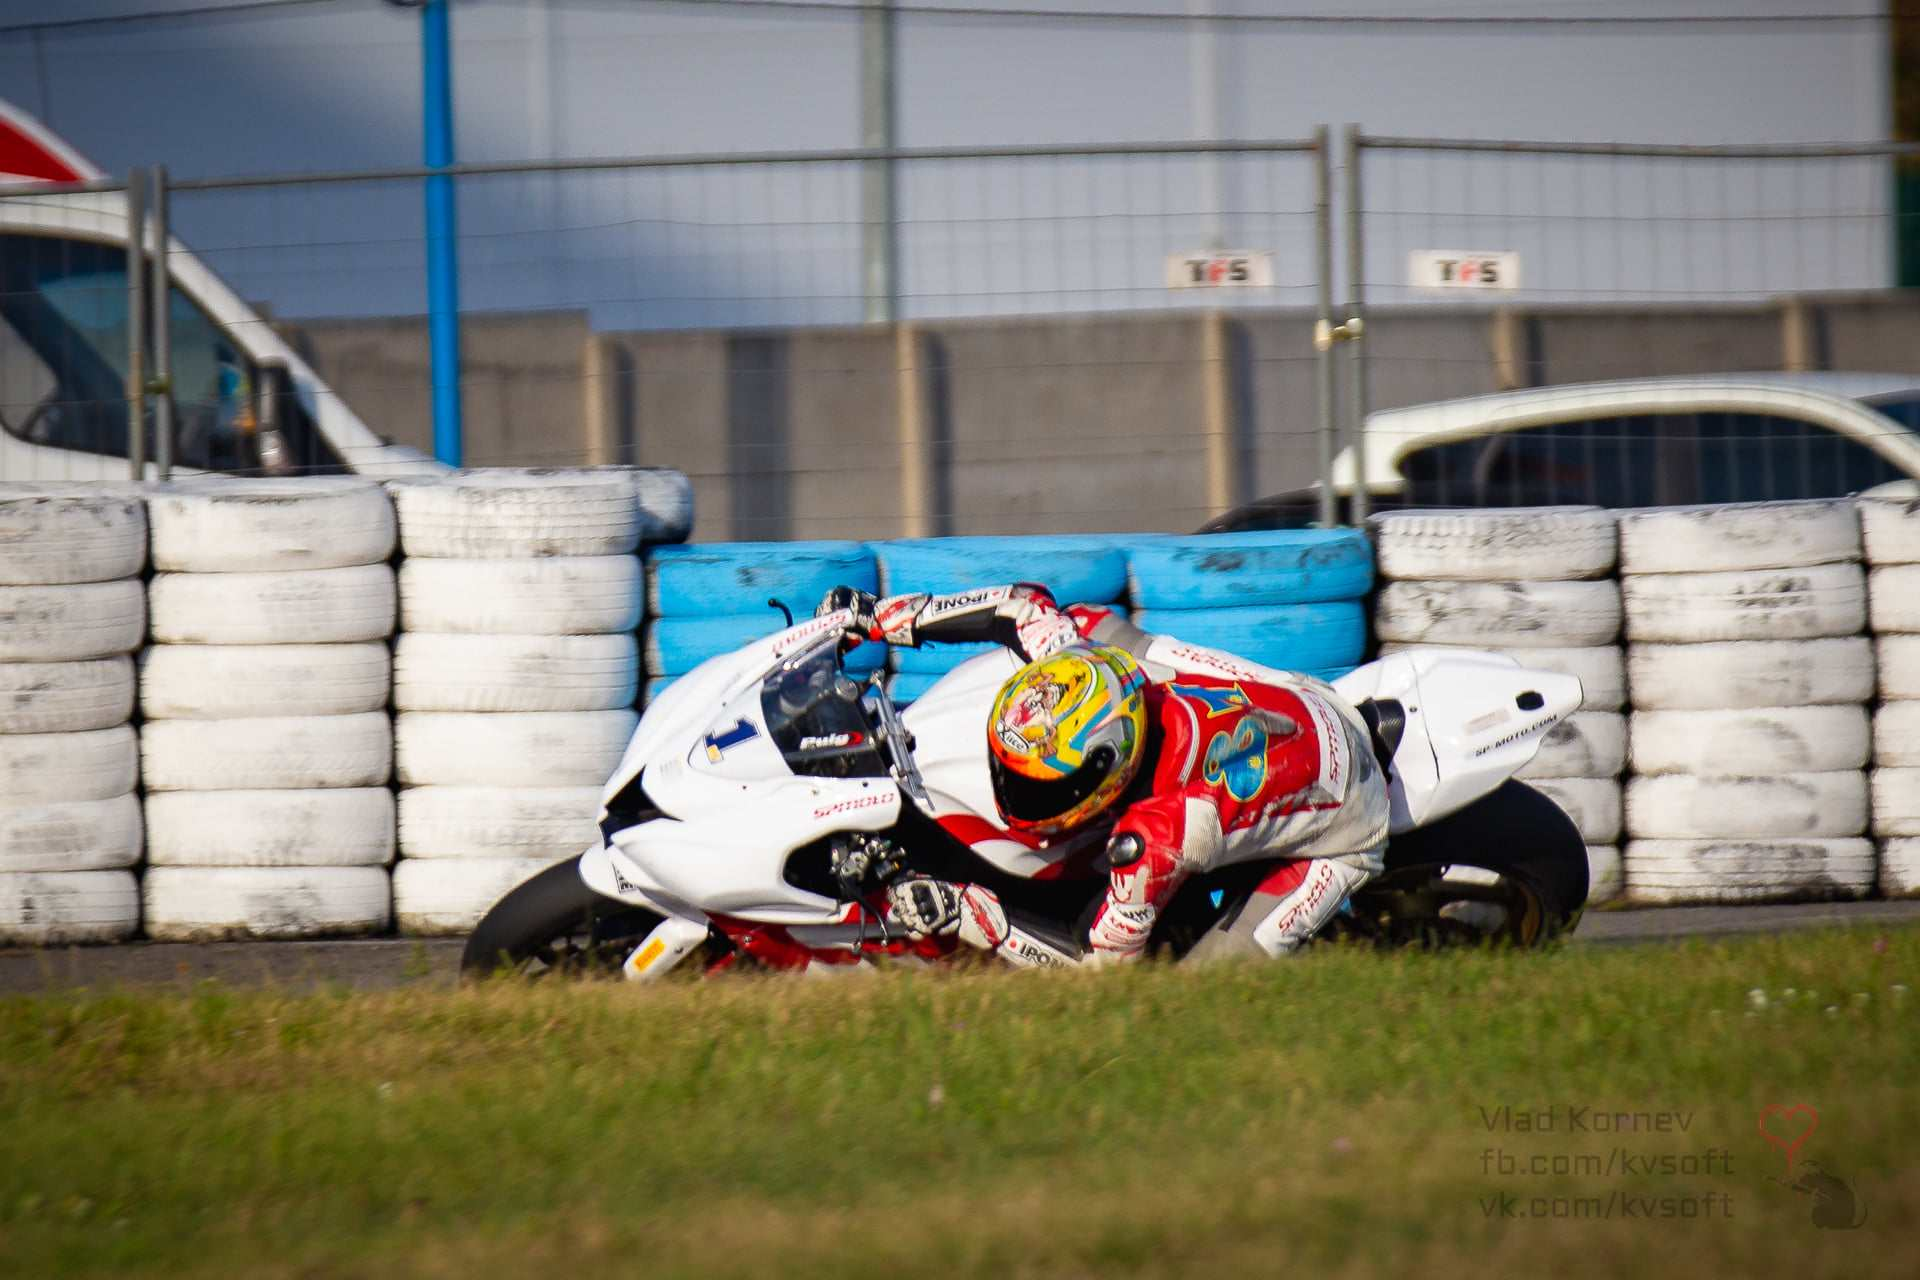 5-6_etap_MotoGPUkraine_076